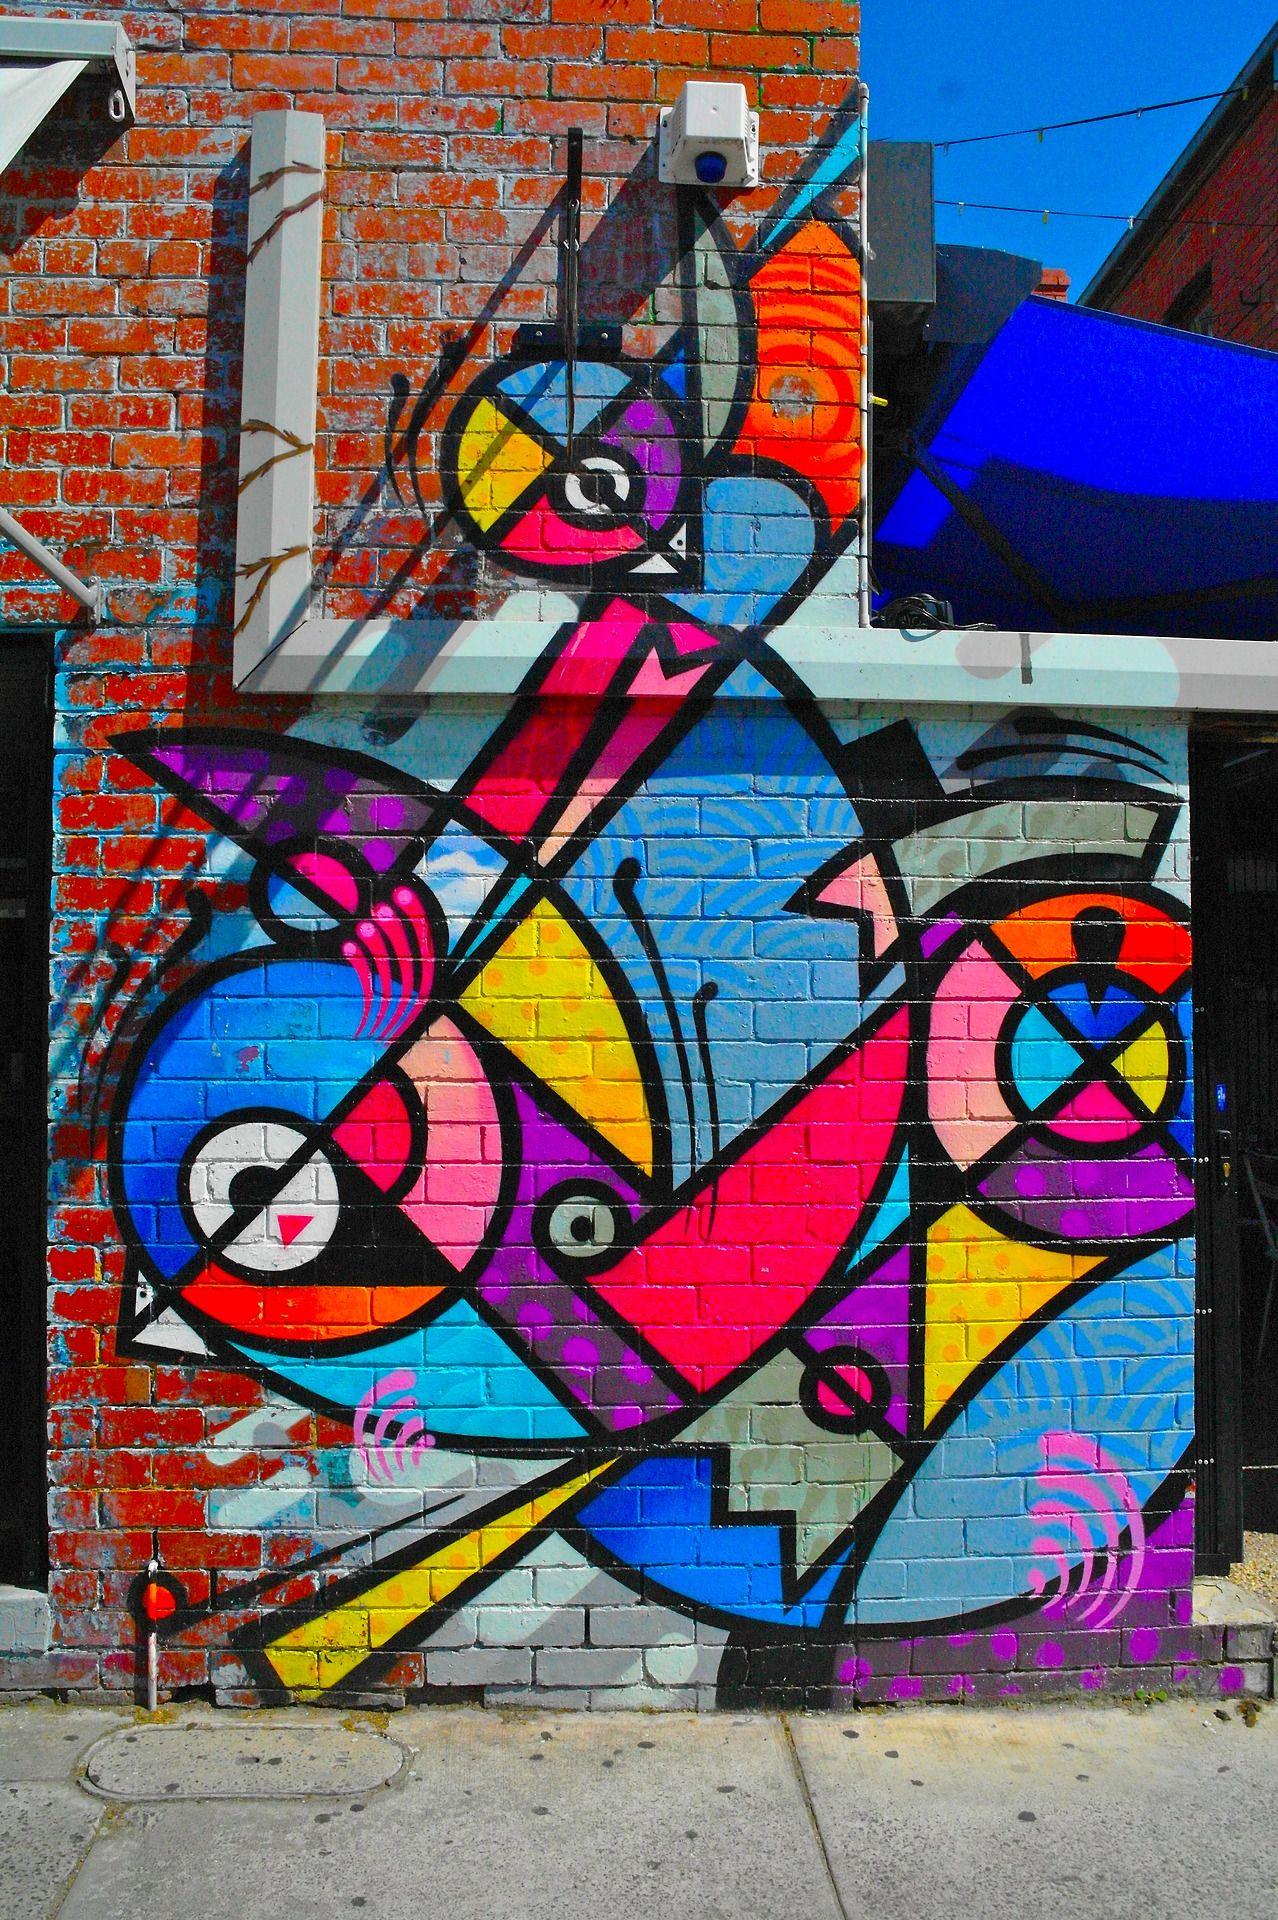 Abstract Birds Graffiti Streetart Street Art Graffiti Urban Art Graffiti Murals Street Art